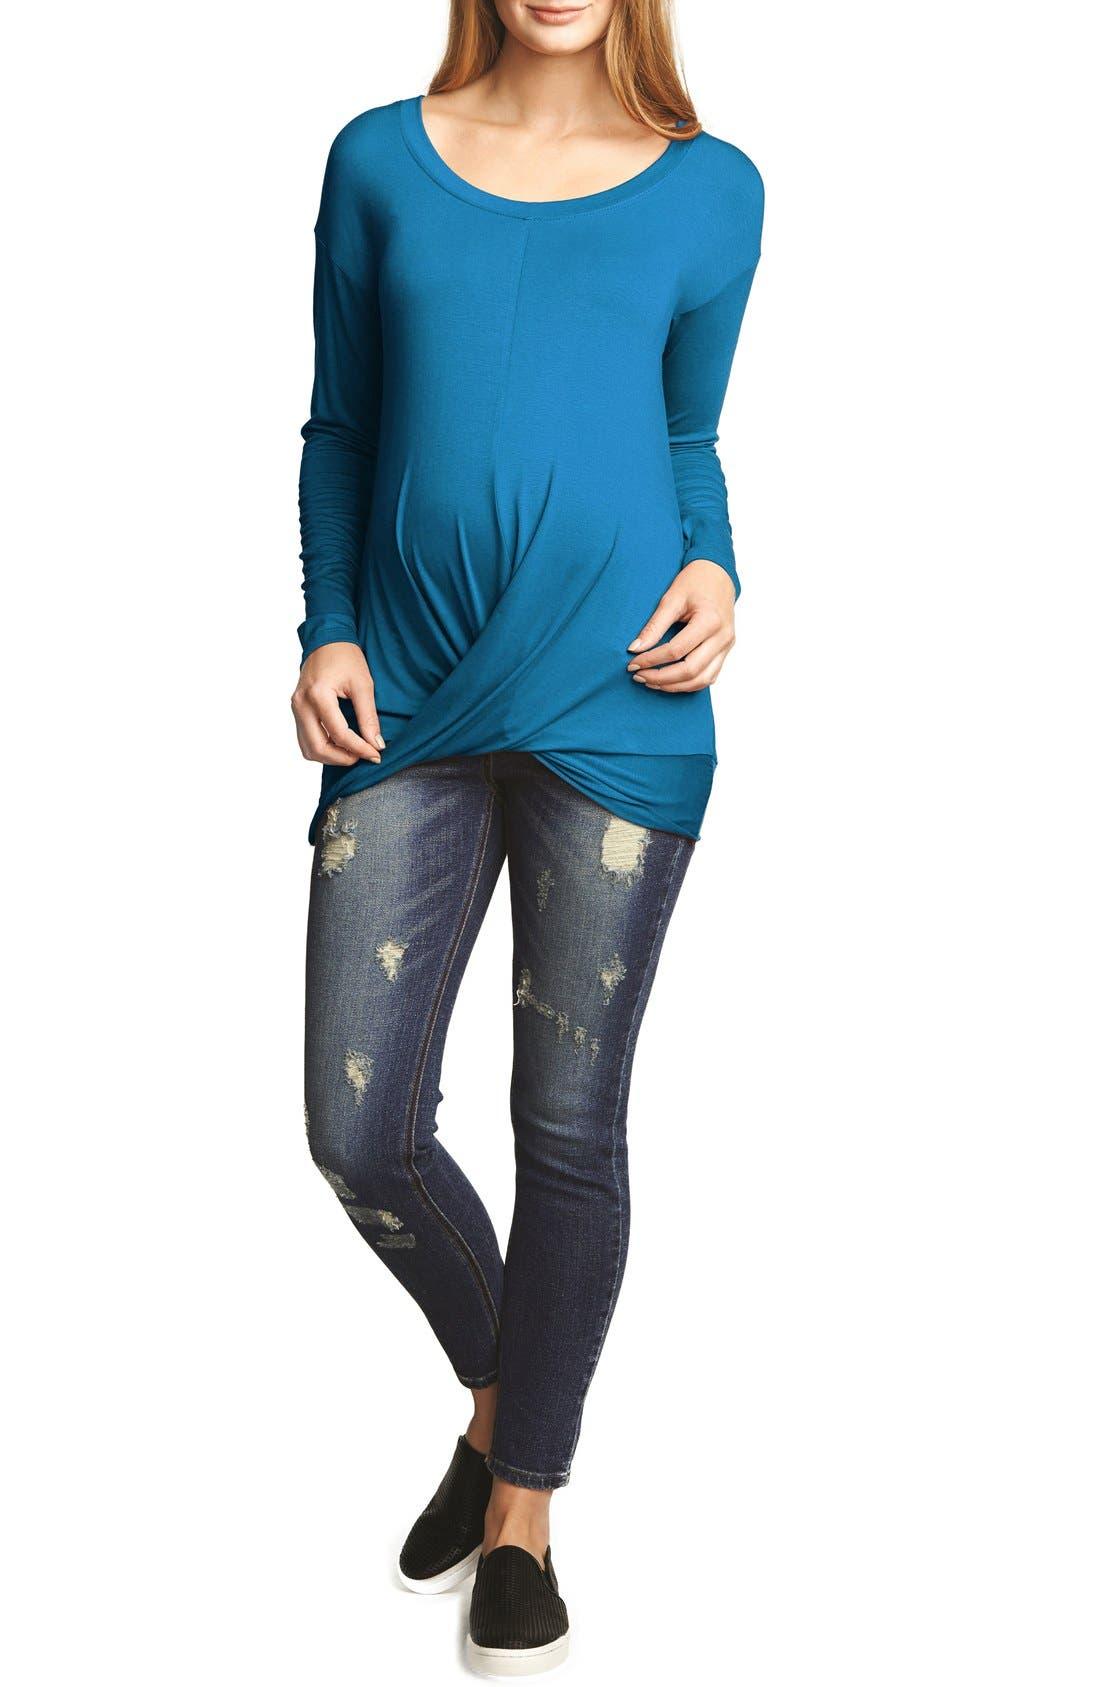 Alternate Image 1 Selected - The Urban Ma Draped Maternity Tunic